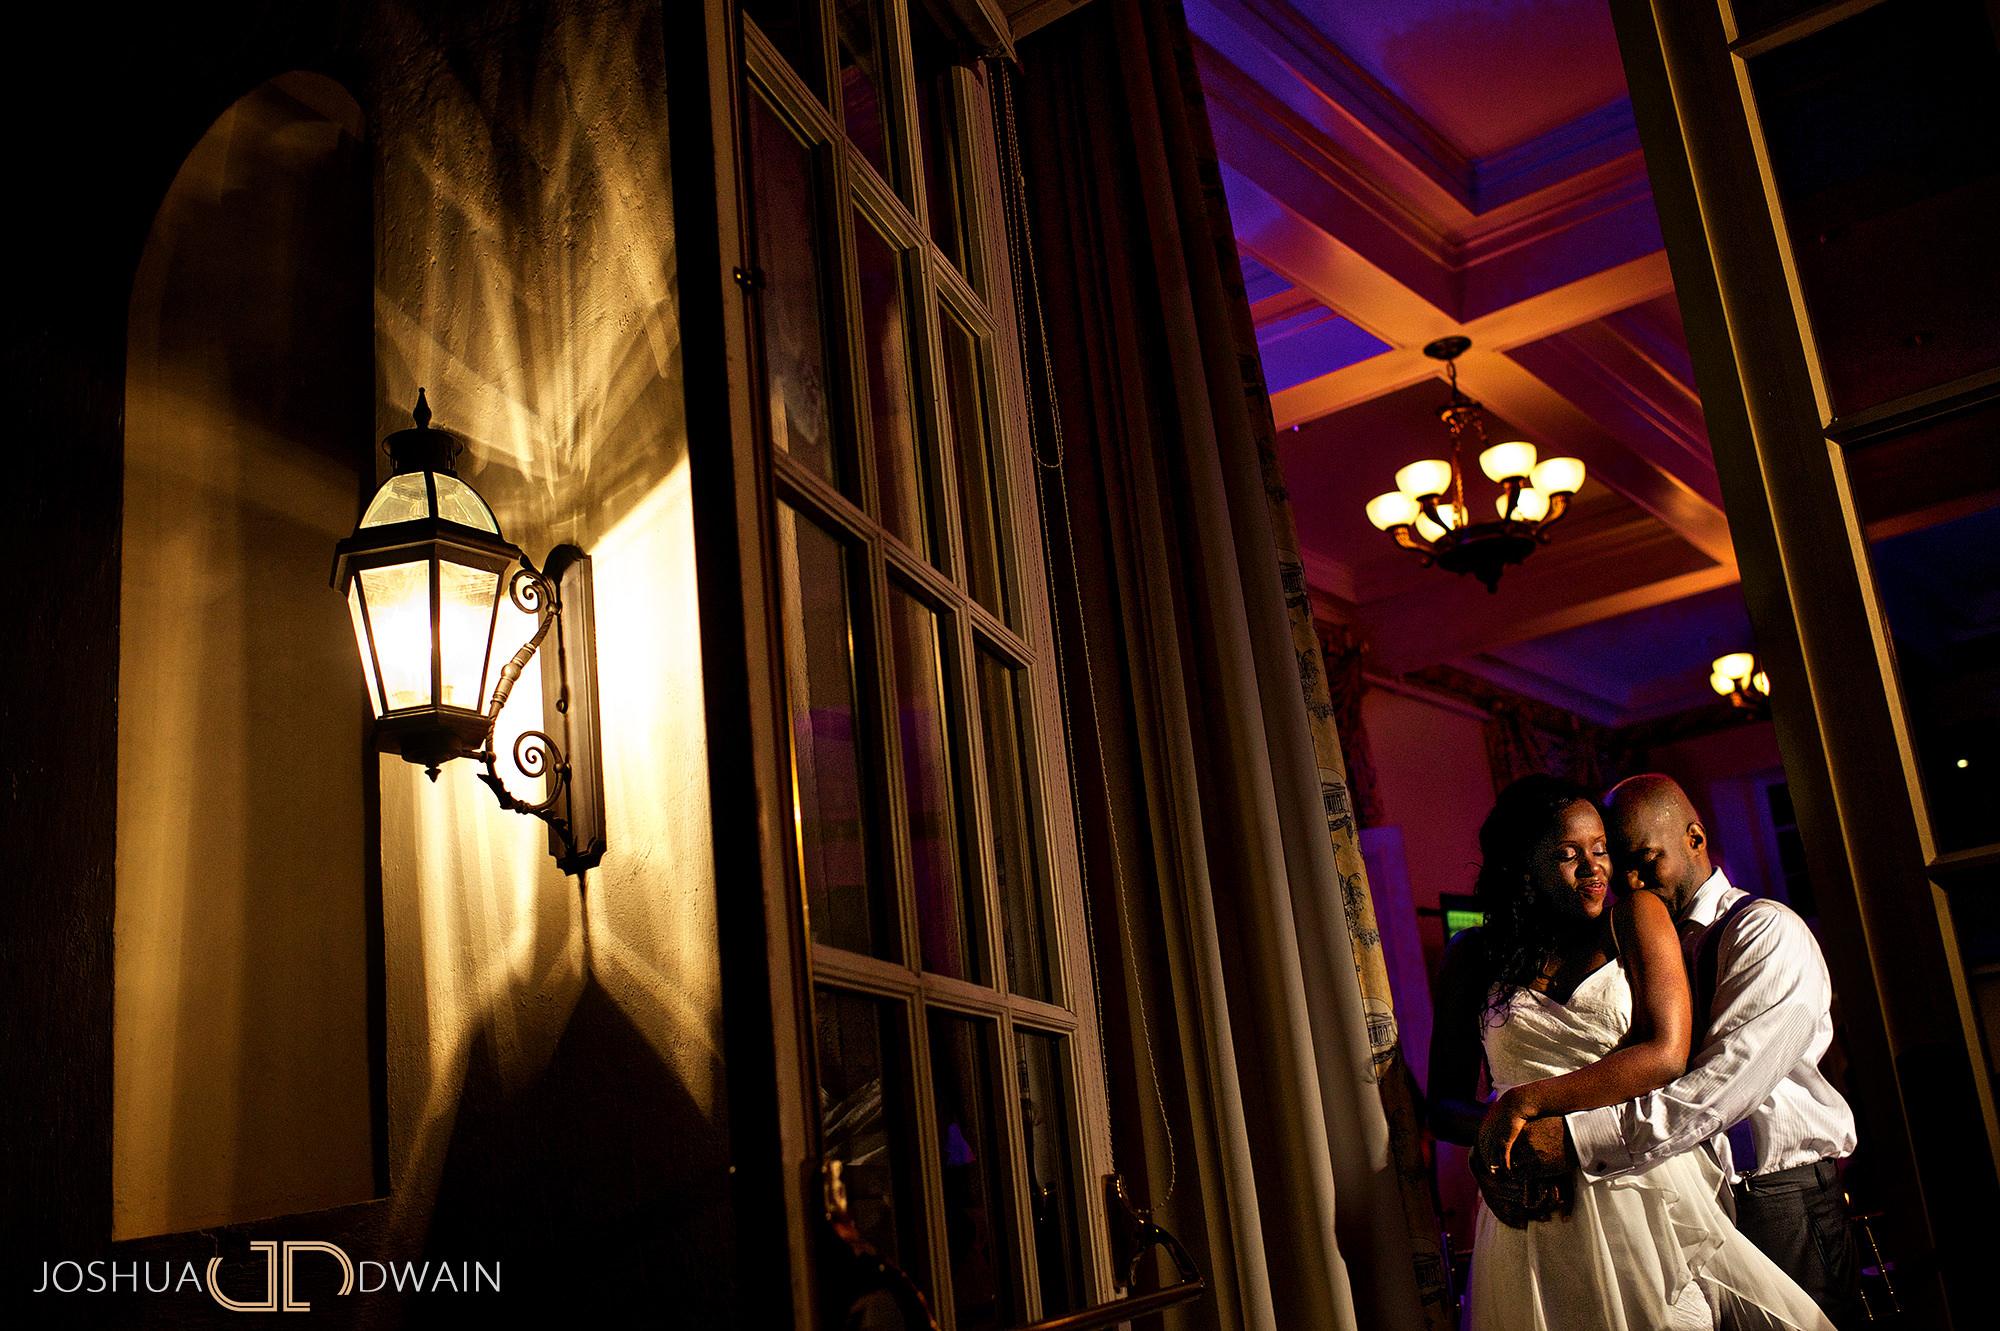 nancy-jason-001-wadsworth-estates-middletown-ct-wedding-photographer-joshua-dwain-photography-